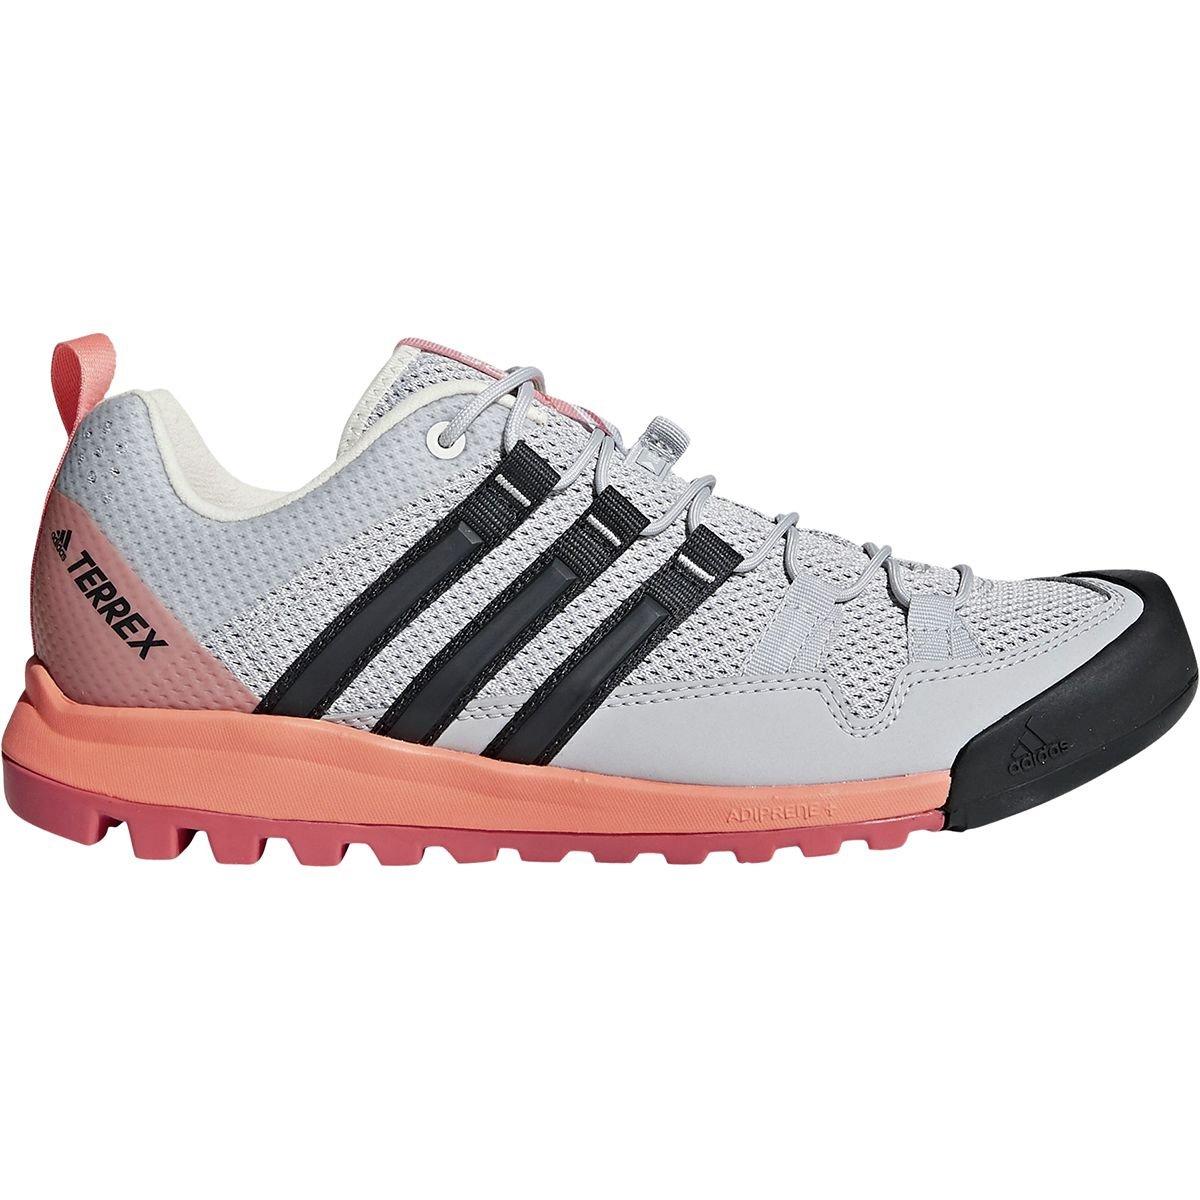 Adidas Sport Performance Women's Terrex Solo W Sneakers, Grey, 7 M